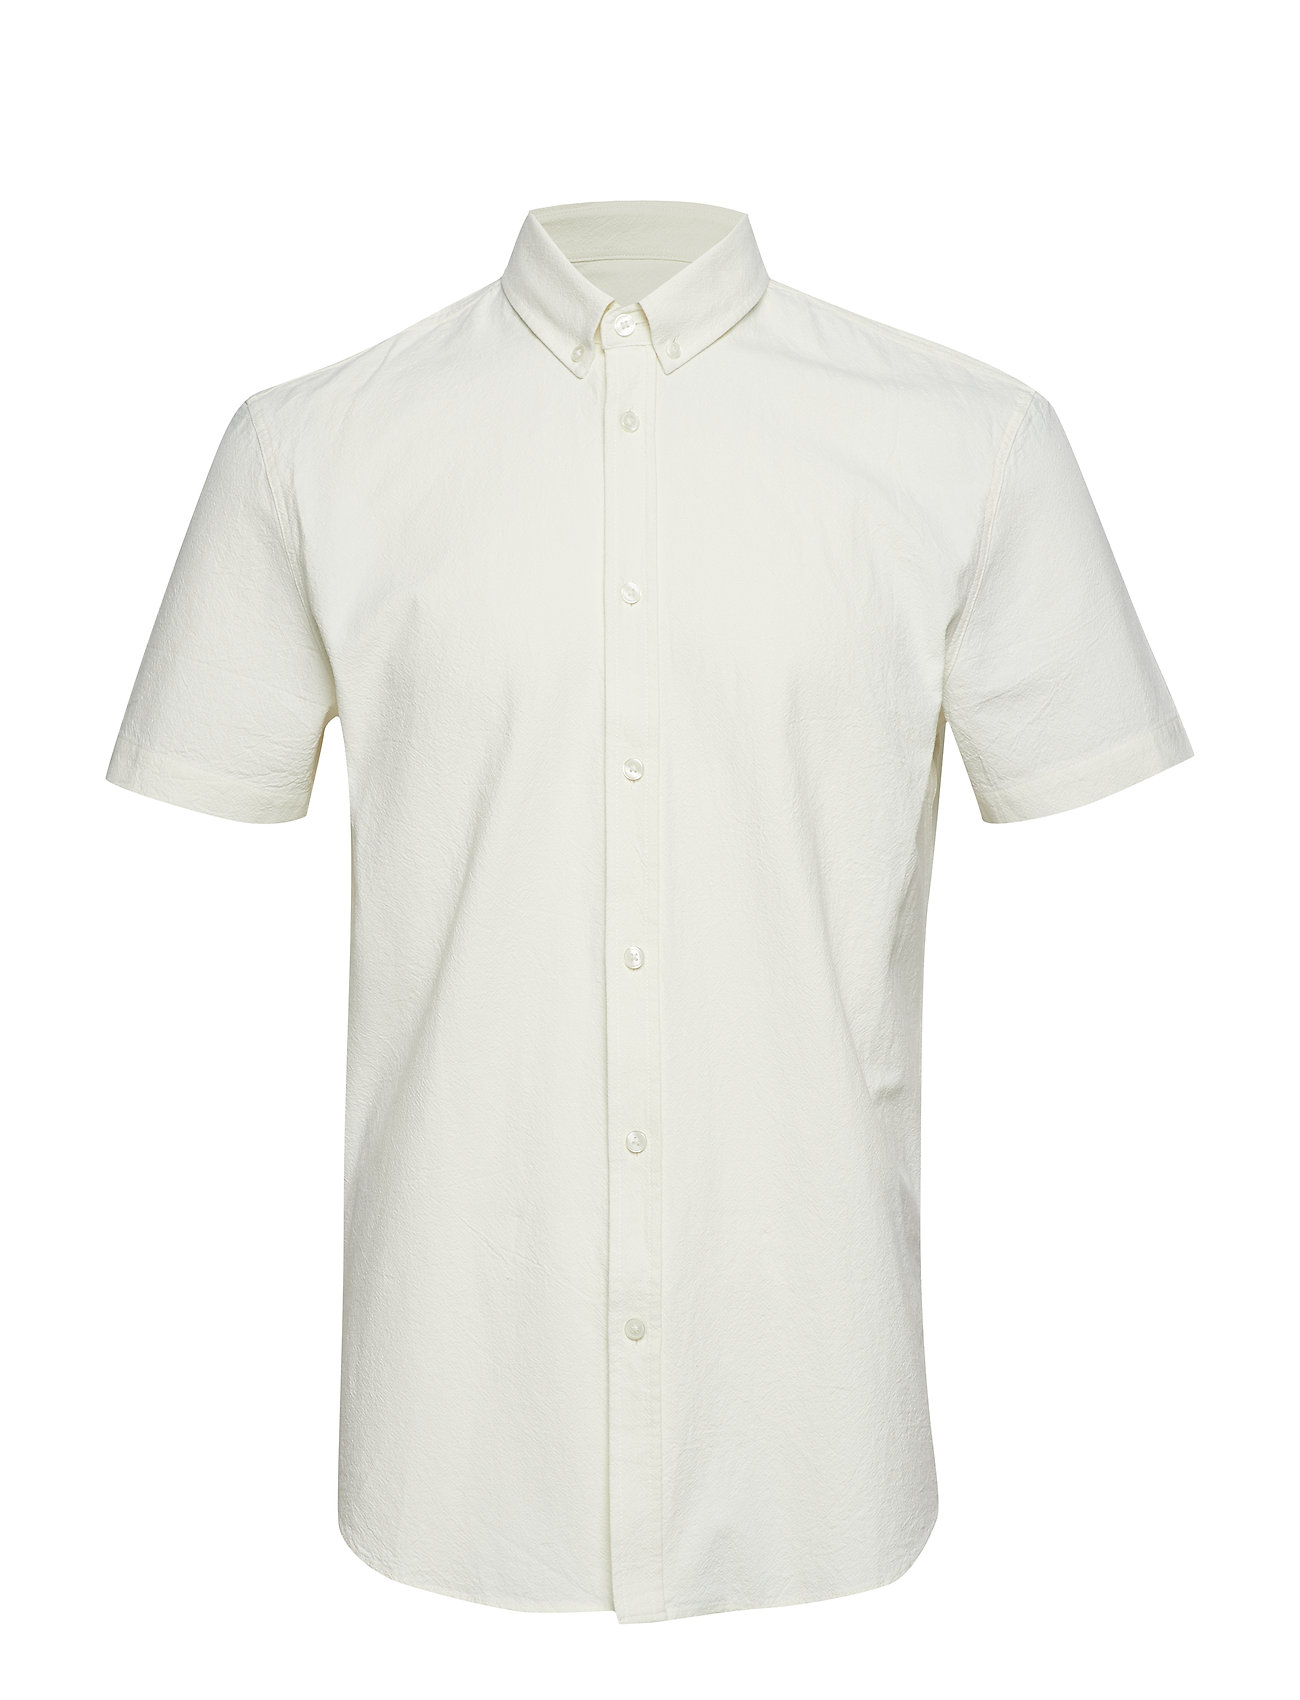 Shirt 10938white Vento Bx AsparagusSamsøeamp; Vento Bx vnNw80Om